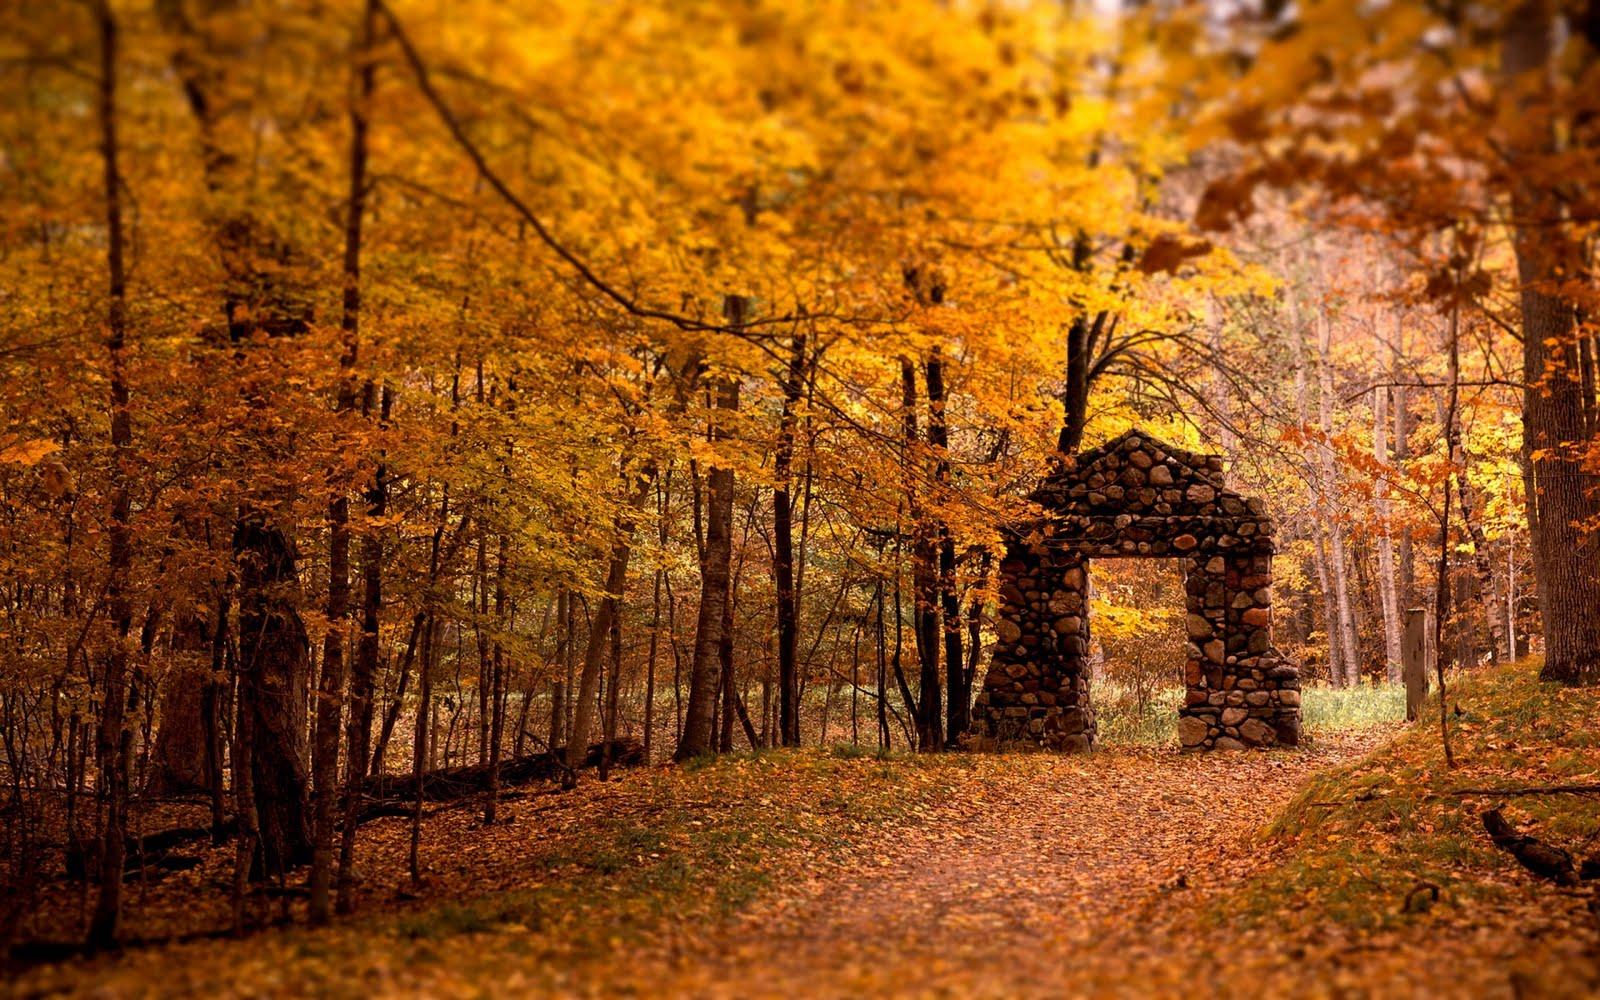 Autumn Desktop Background - WallpaperSafari